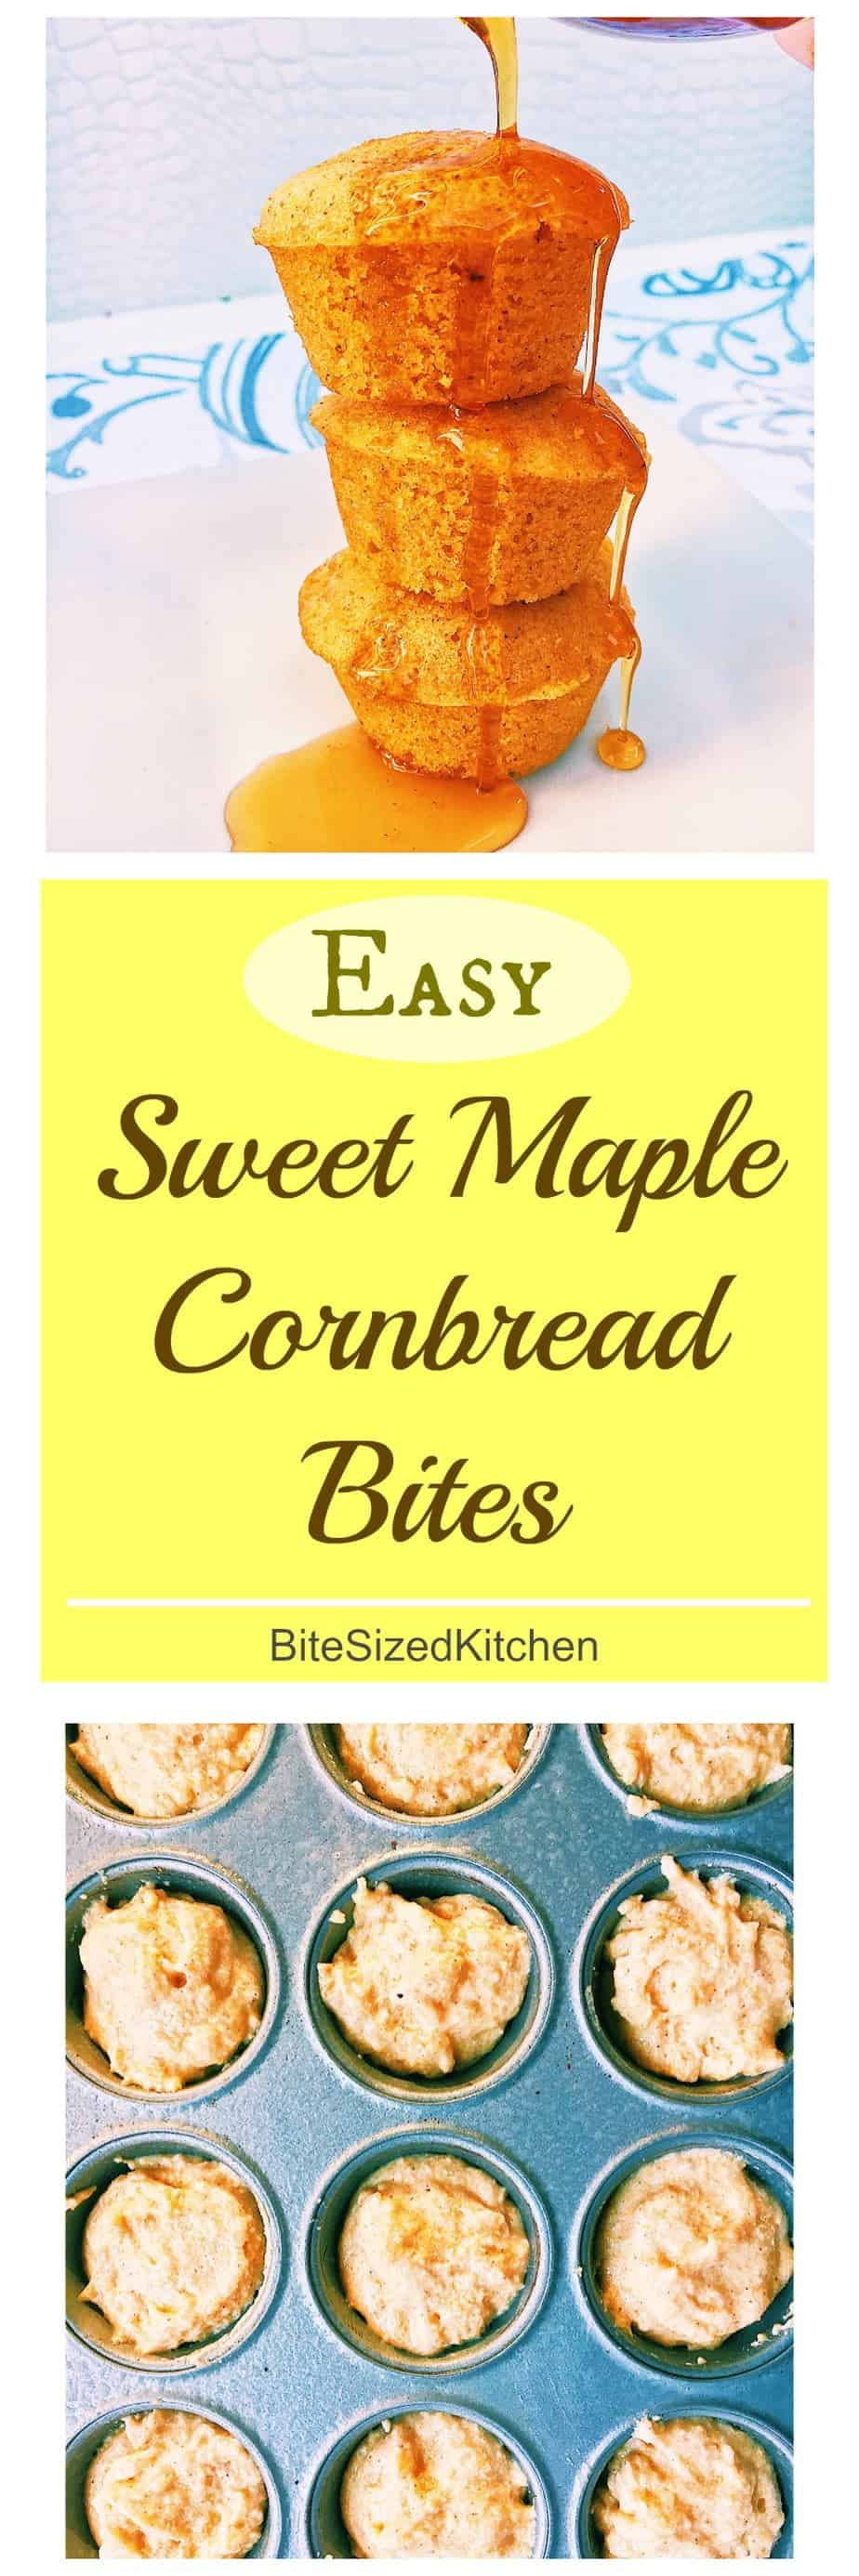 Easy Sweet Cornbread Recipe | Sweet cornbread muffins | Moist cornbread bites | Homemade cornbread muffins | self rising cornbread muffins | Moist cornbread bites recipe